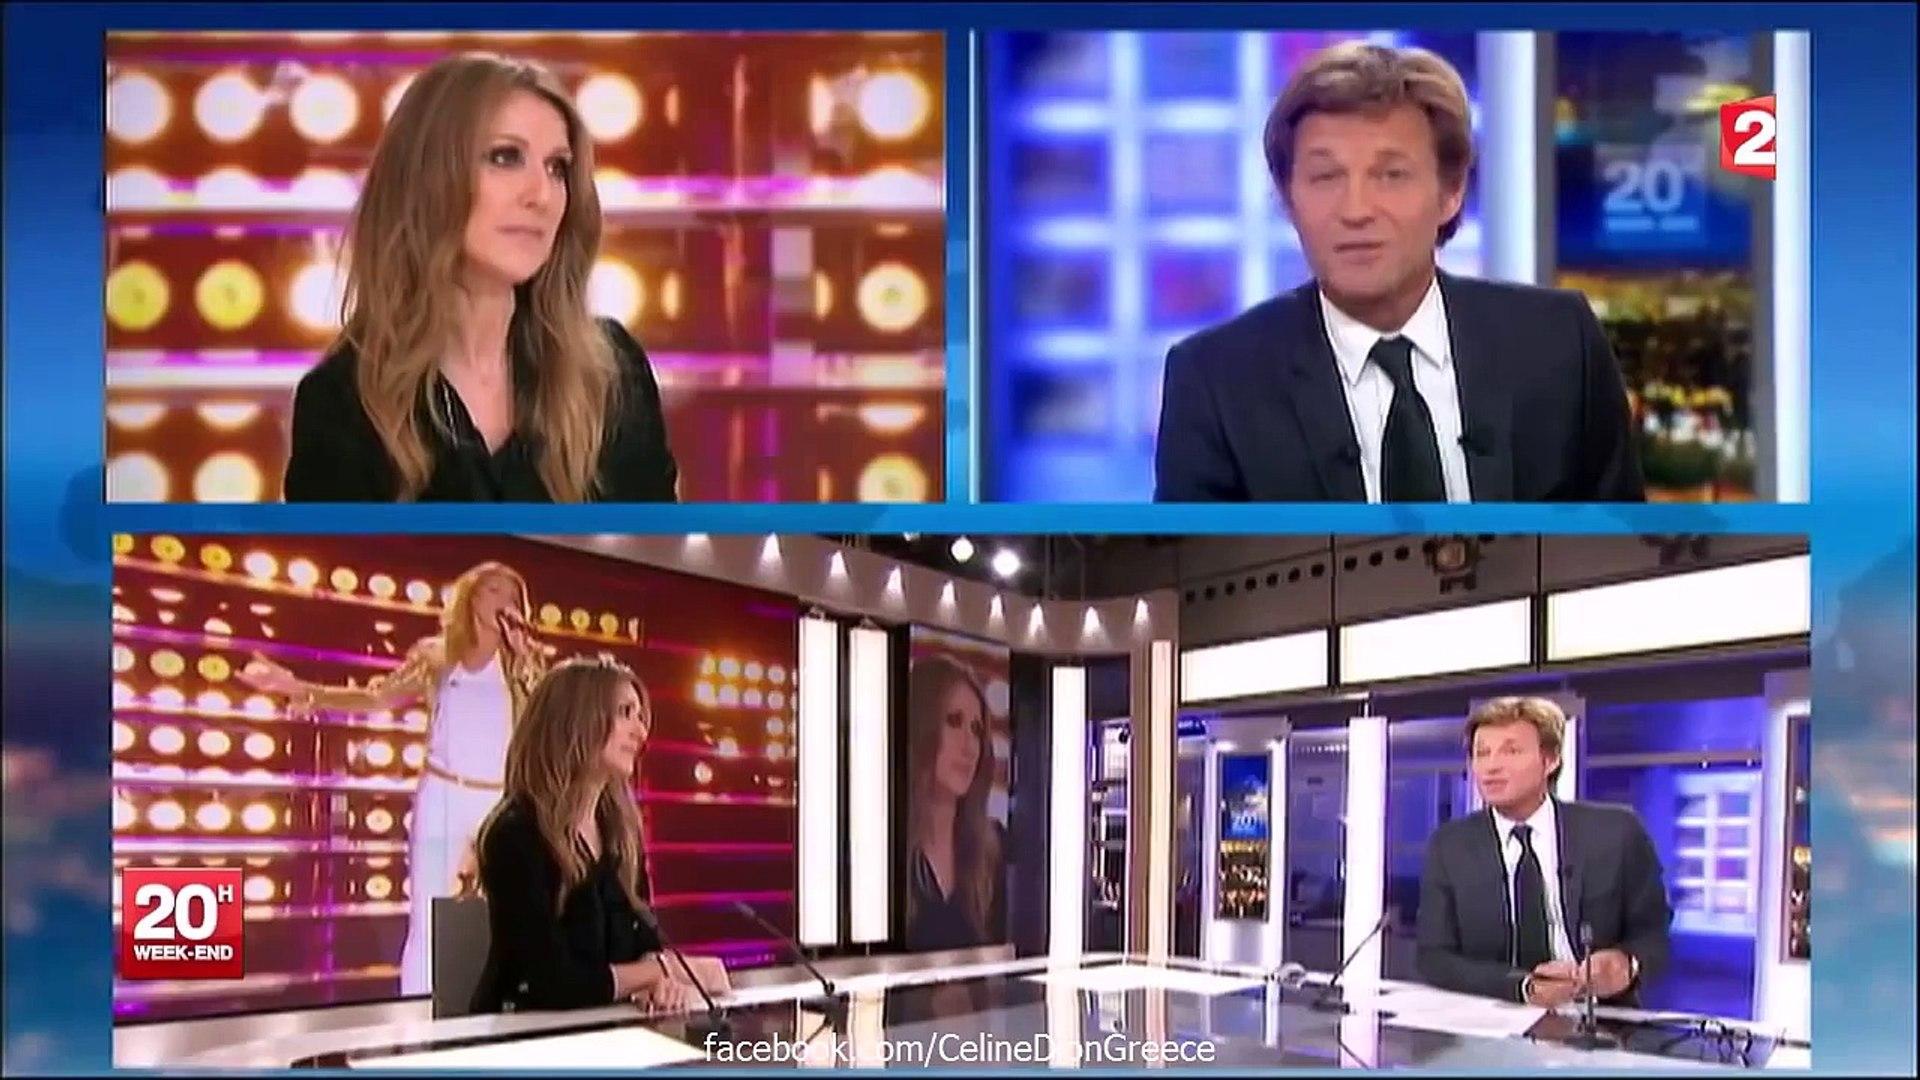 Celine Dion Interview on France 2 News (16_11_2013 HD)